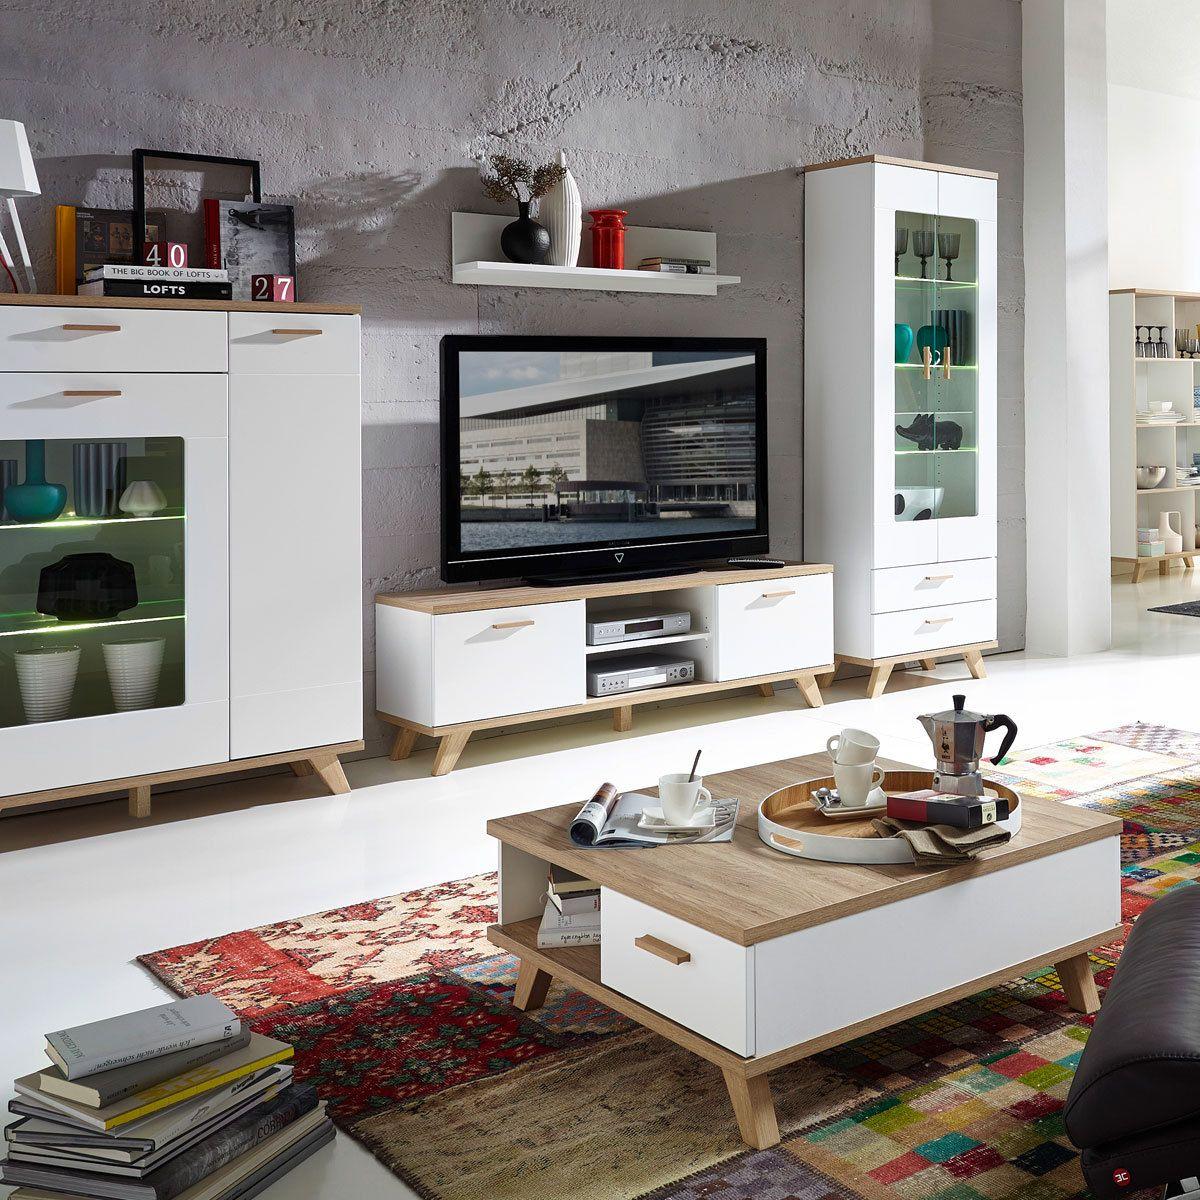 Meuble Tv Oslo 144 Cm Ch Ne Blanc Meuble Tv Tv Et Chene Blanc # Meuble Tv Chene Blanc Scandinave